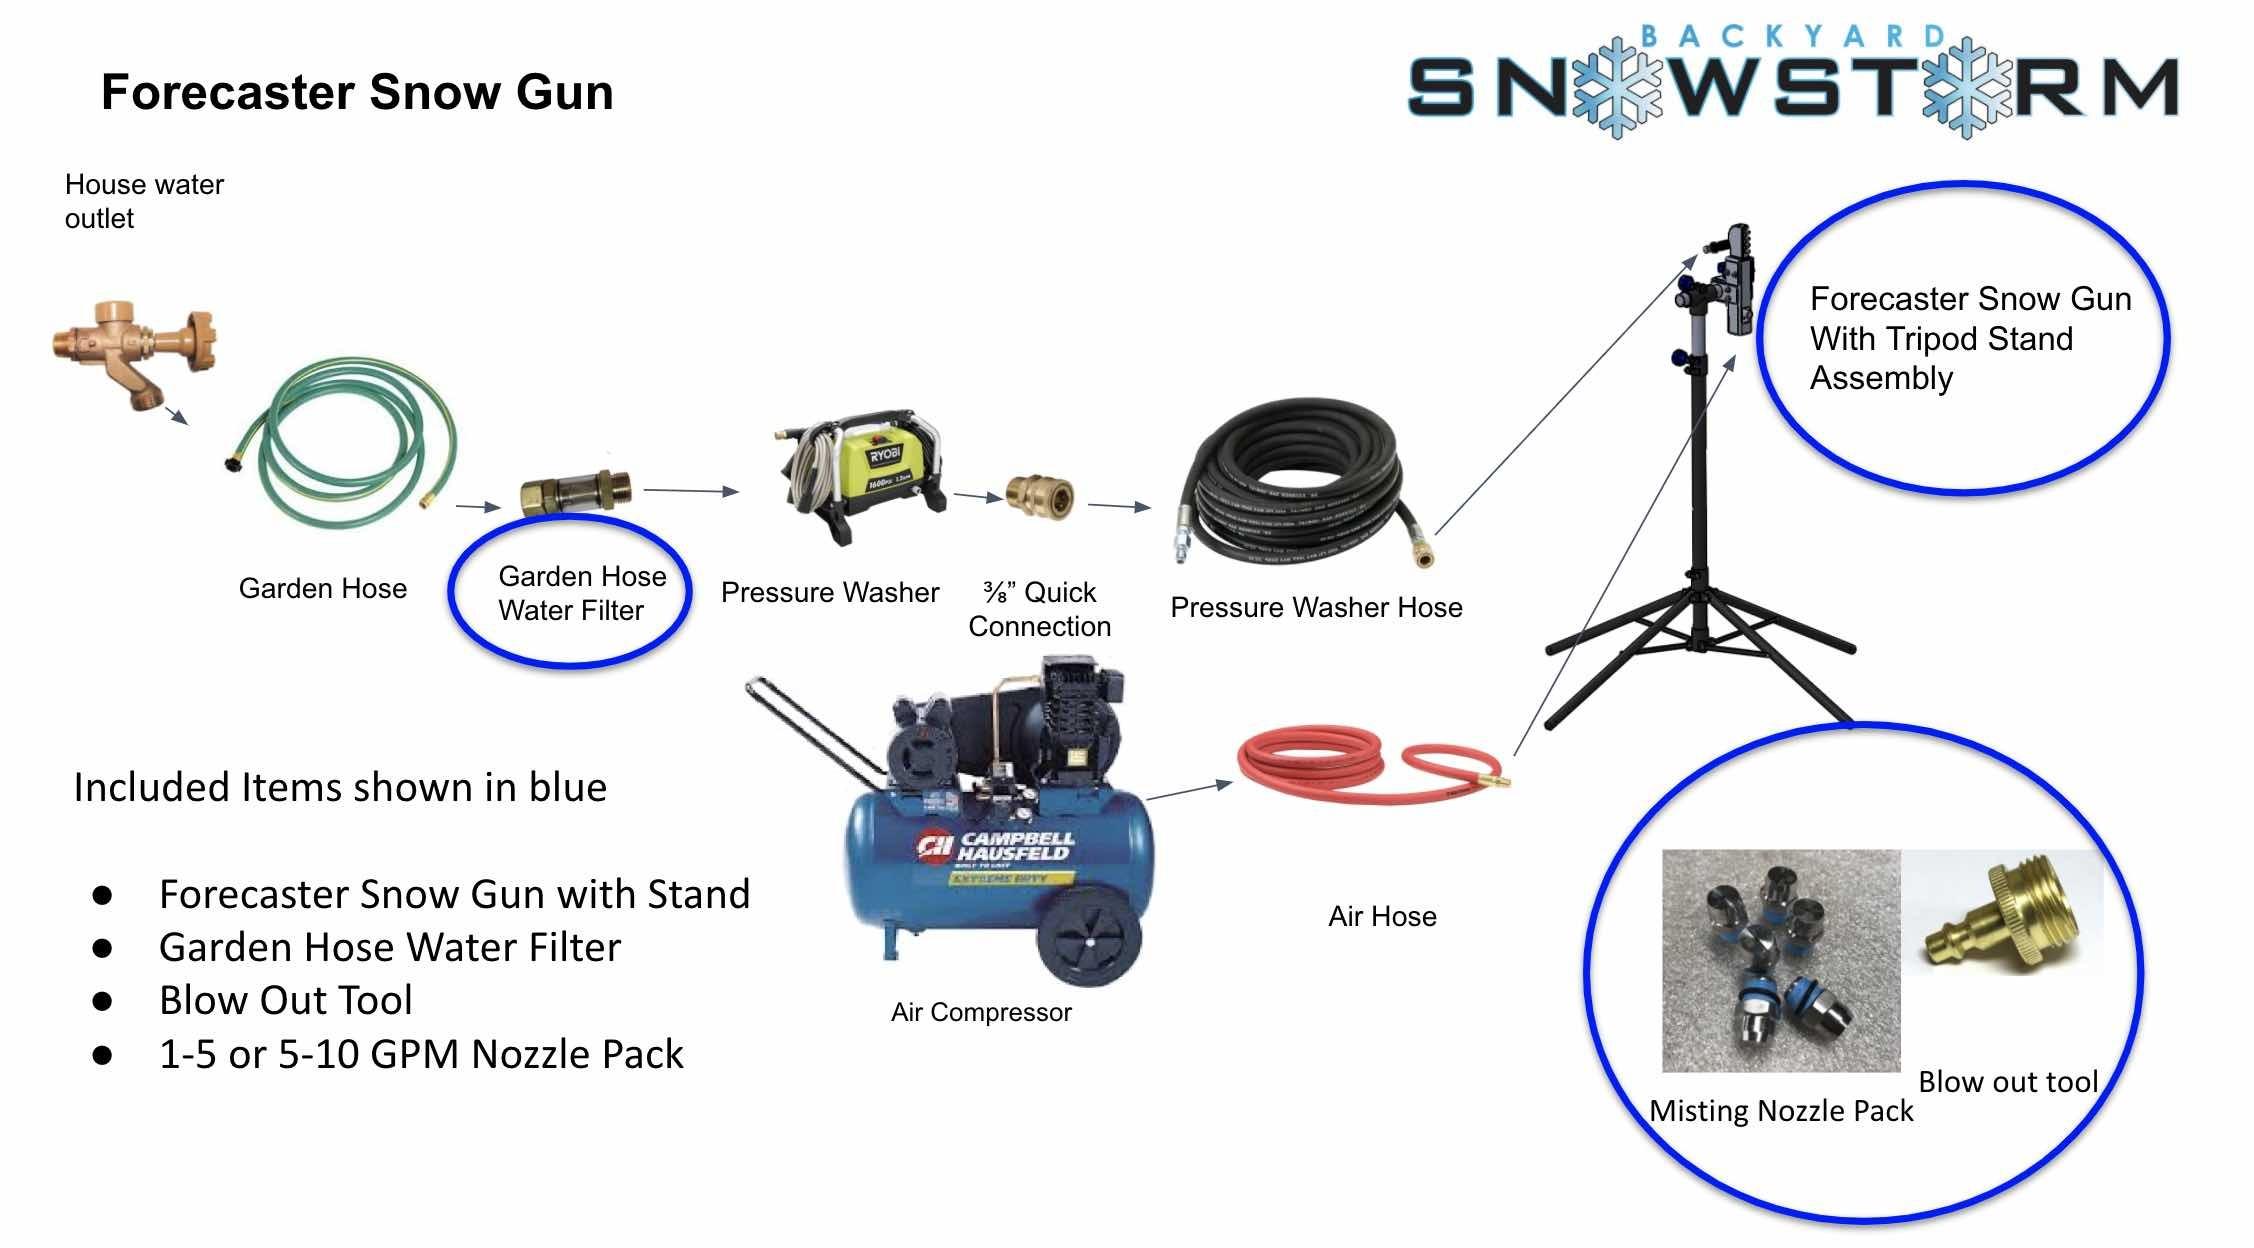 Forecaster Snow Gun